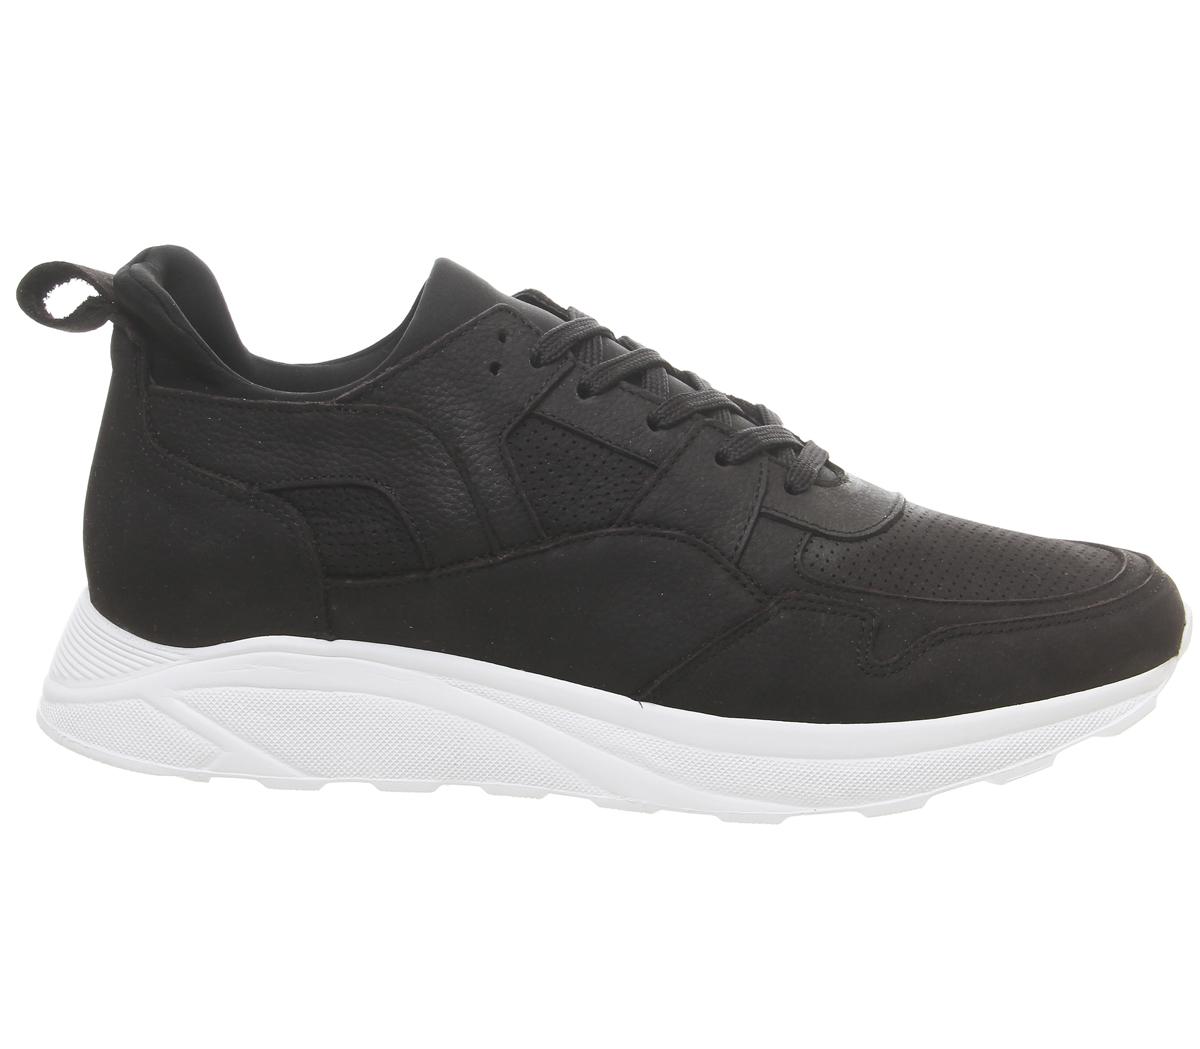 Mens-Office-Lacrosse-Trainers-Black-Nubuck-Casual-Shoes thumbnail 4